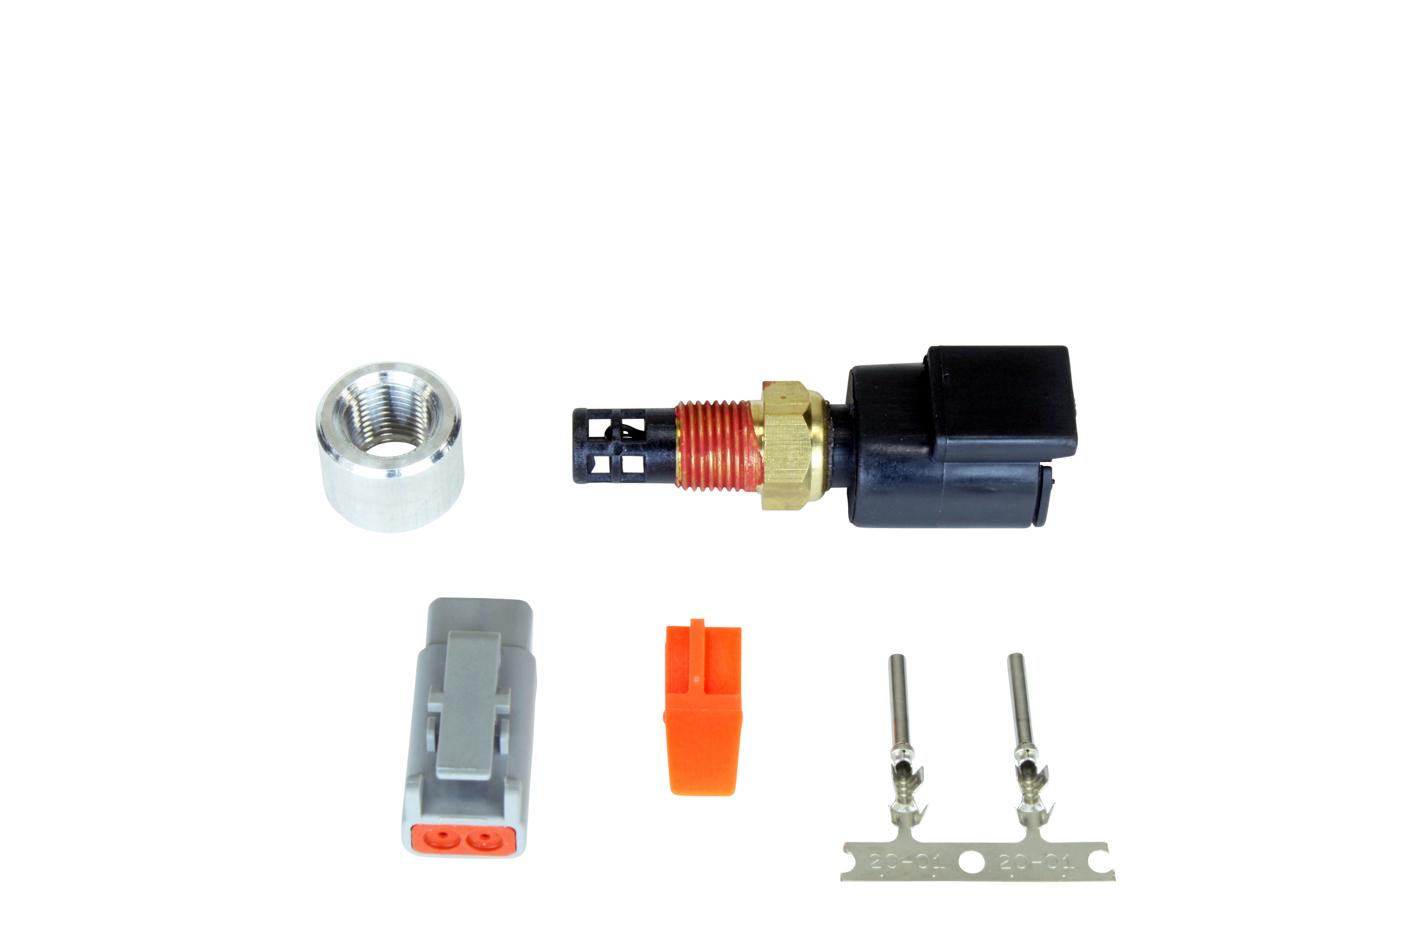 Air Temp Sensor Kit 1/8in NPT